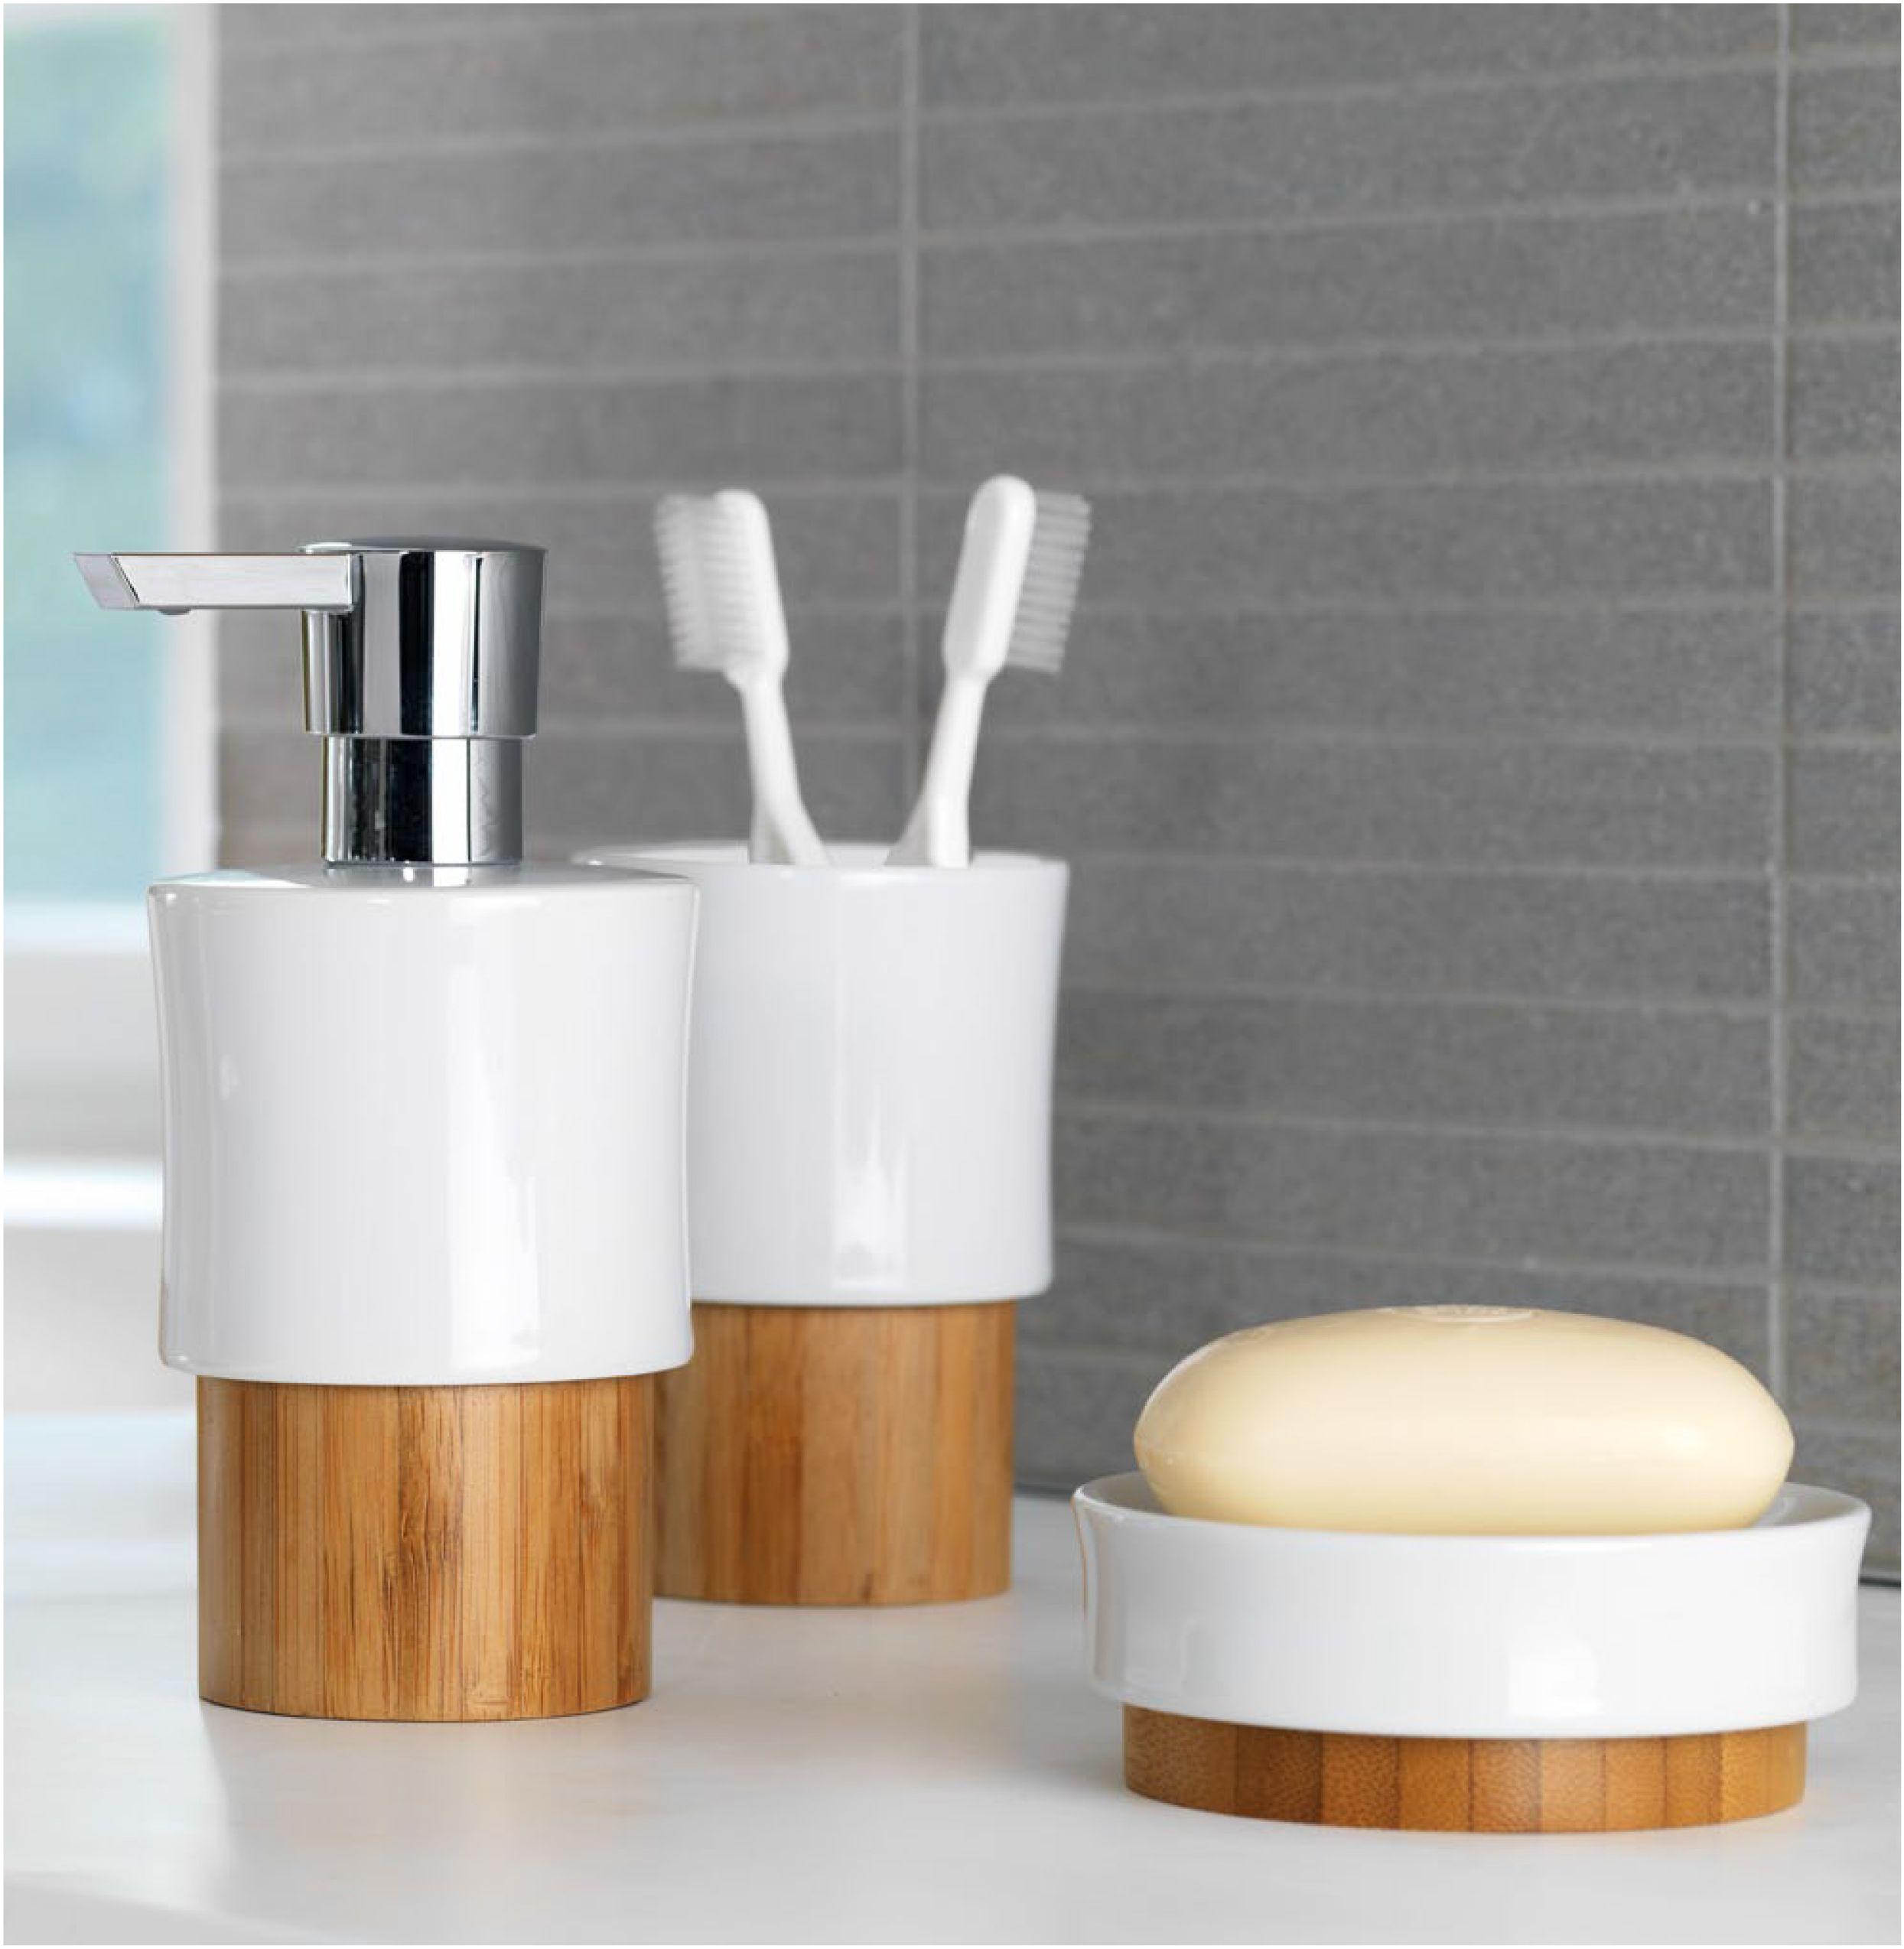 #spirella fjord bamboo bathroom accessories. #bathroom #bamboo | bamboo bathroom accessories